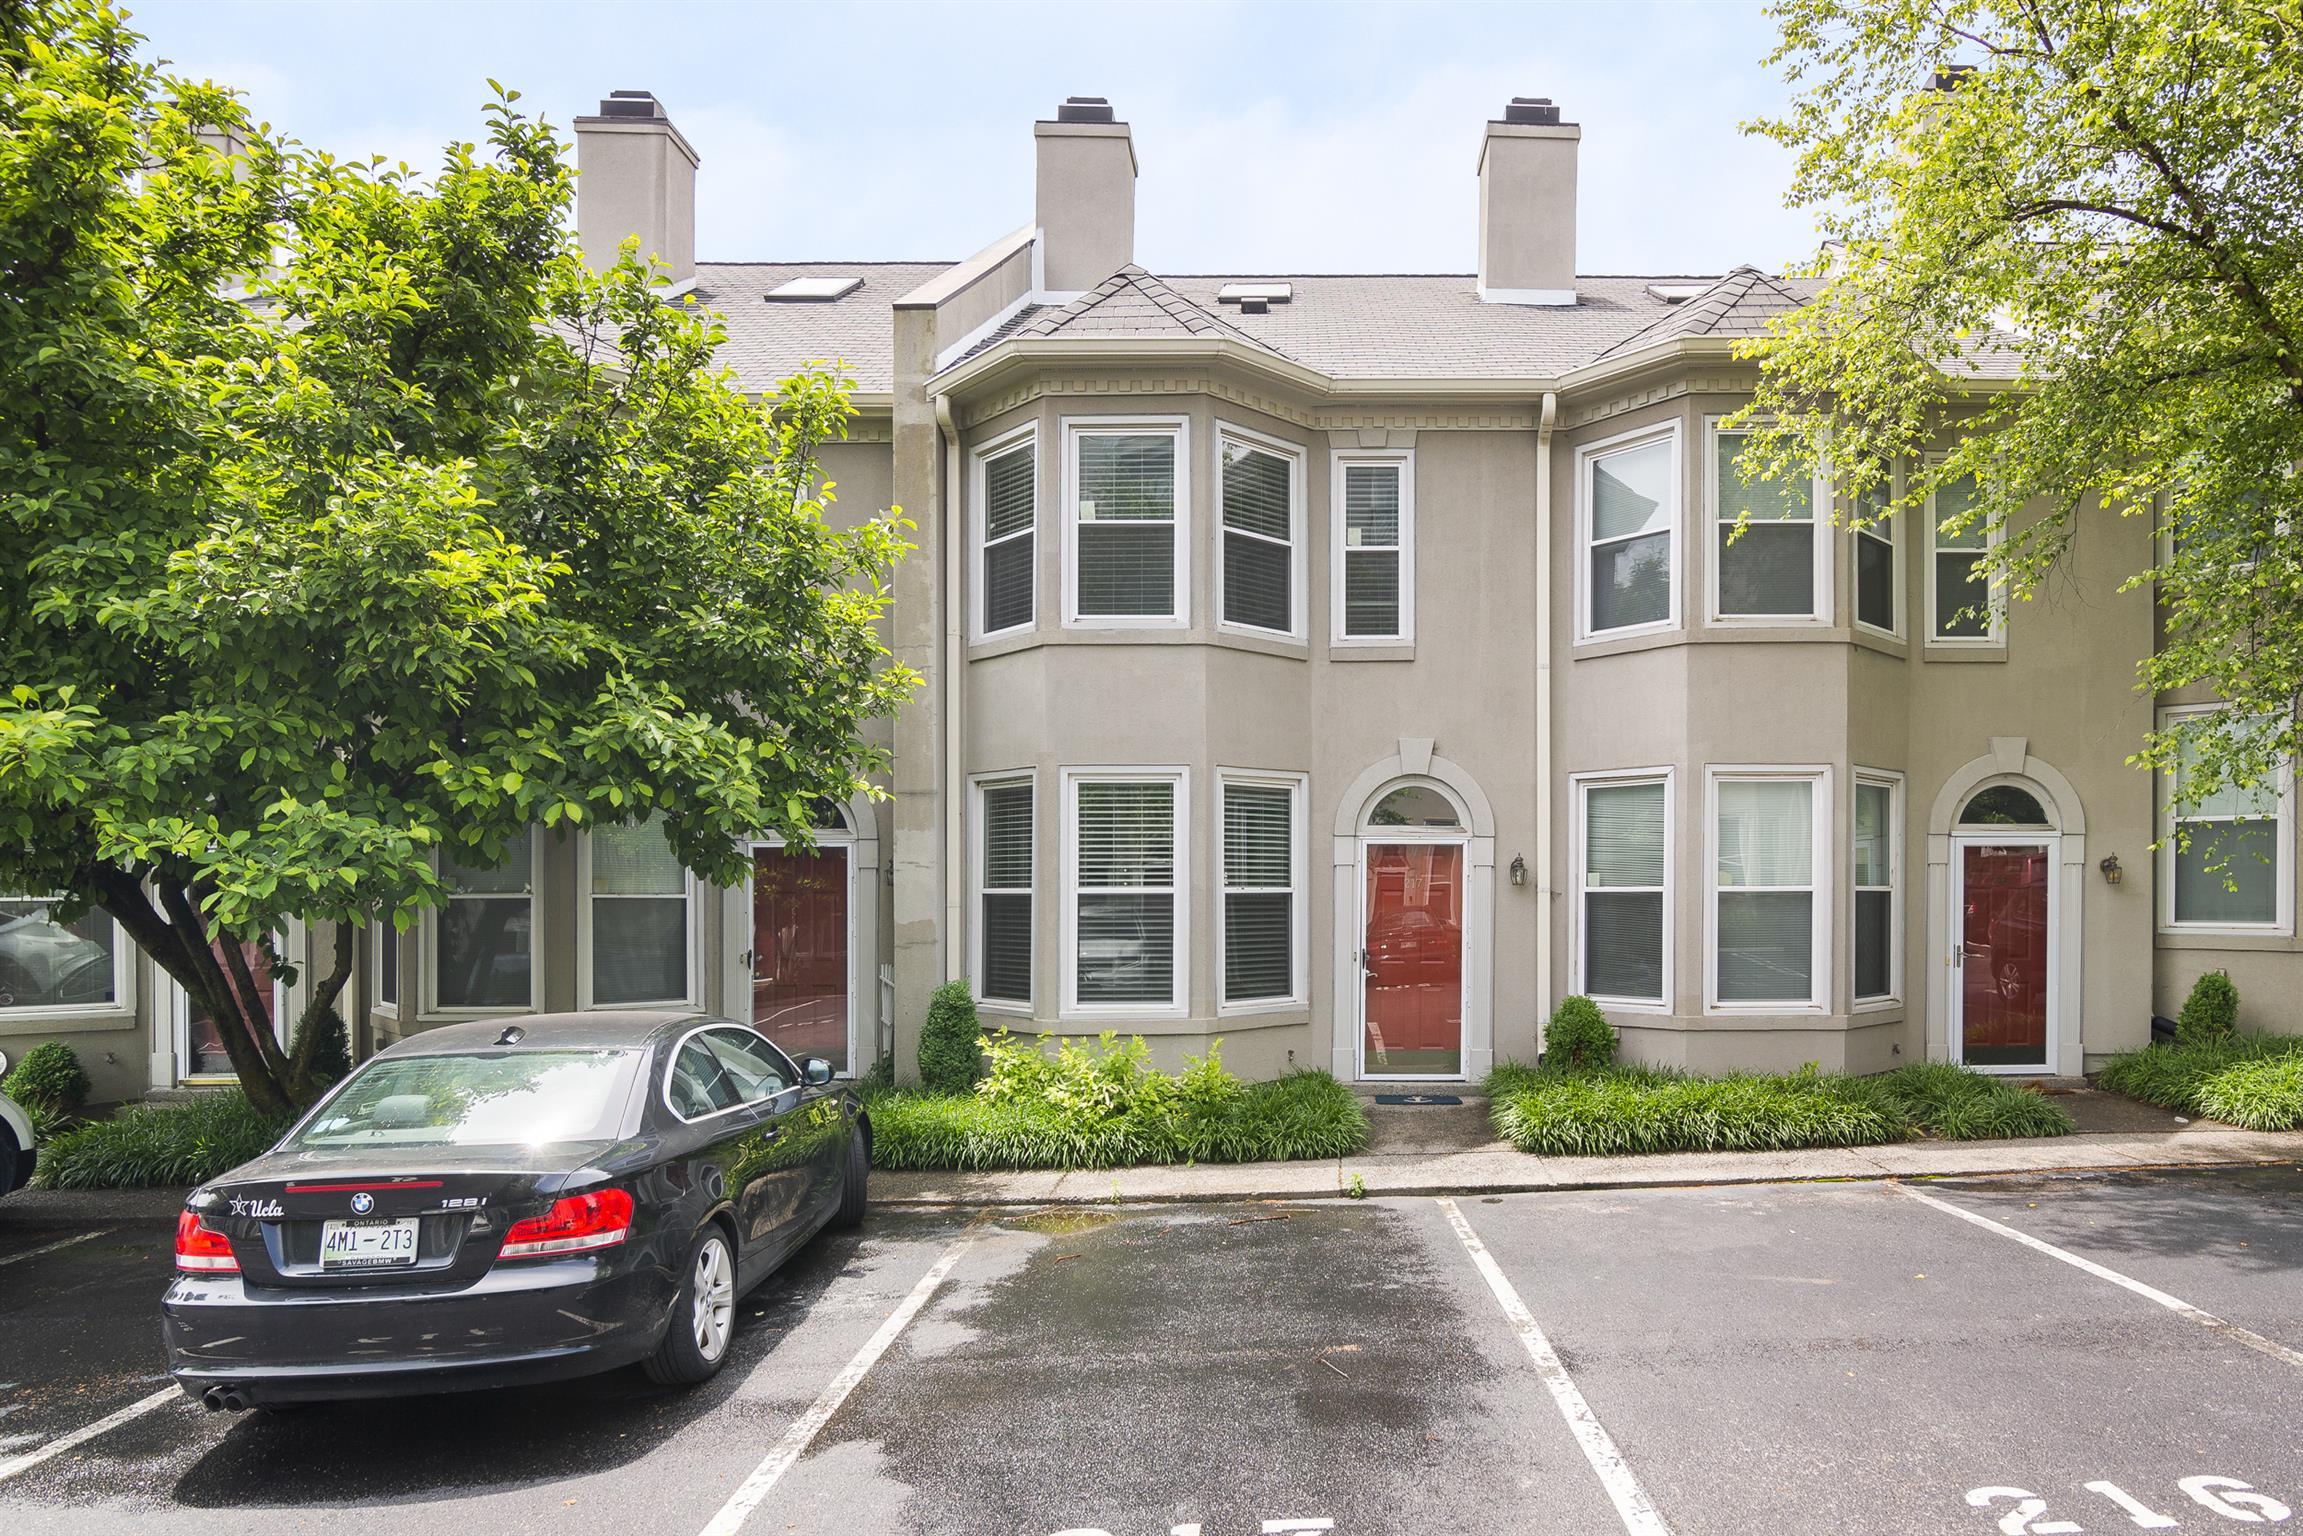 217 Fairmont Ct, Nashville, TN 37203 - Nashville, TN real estate listing